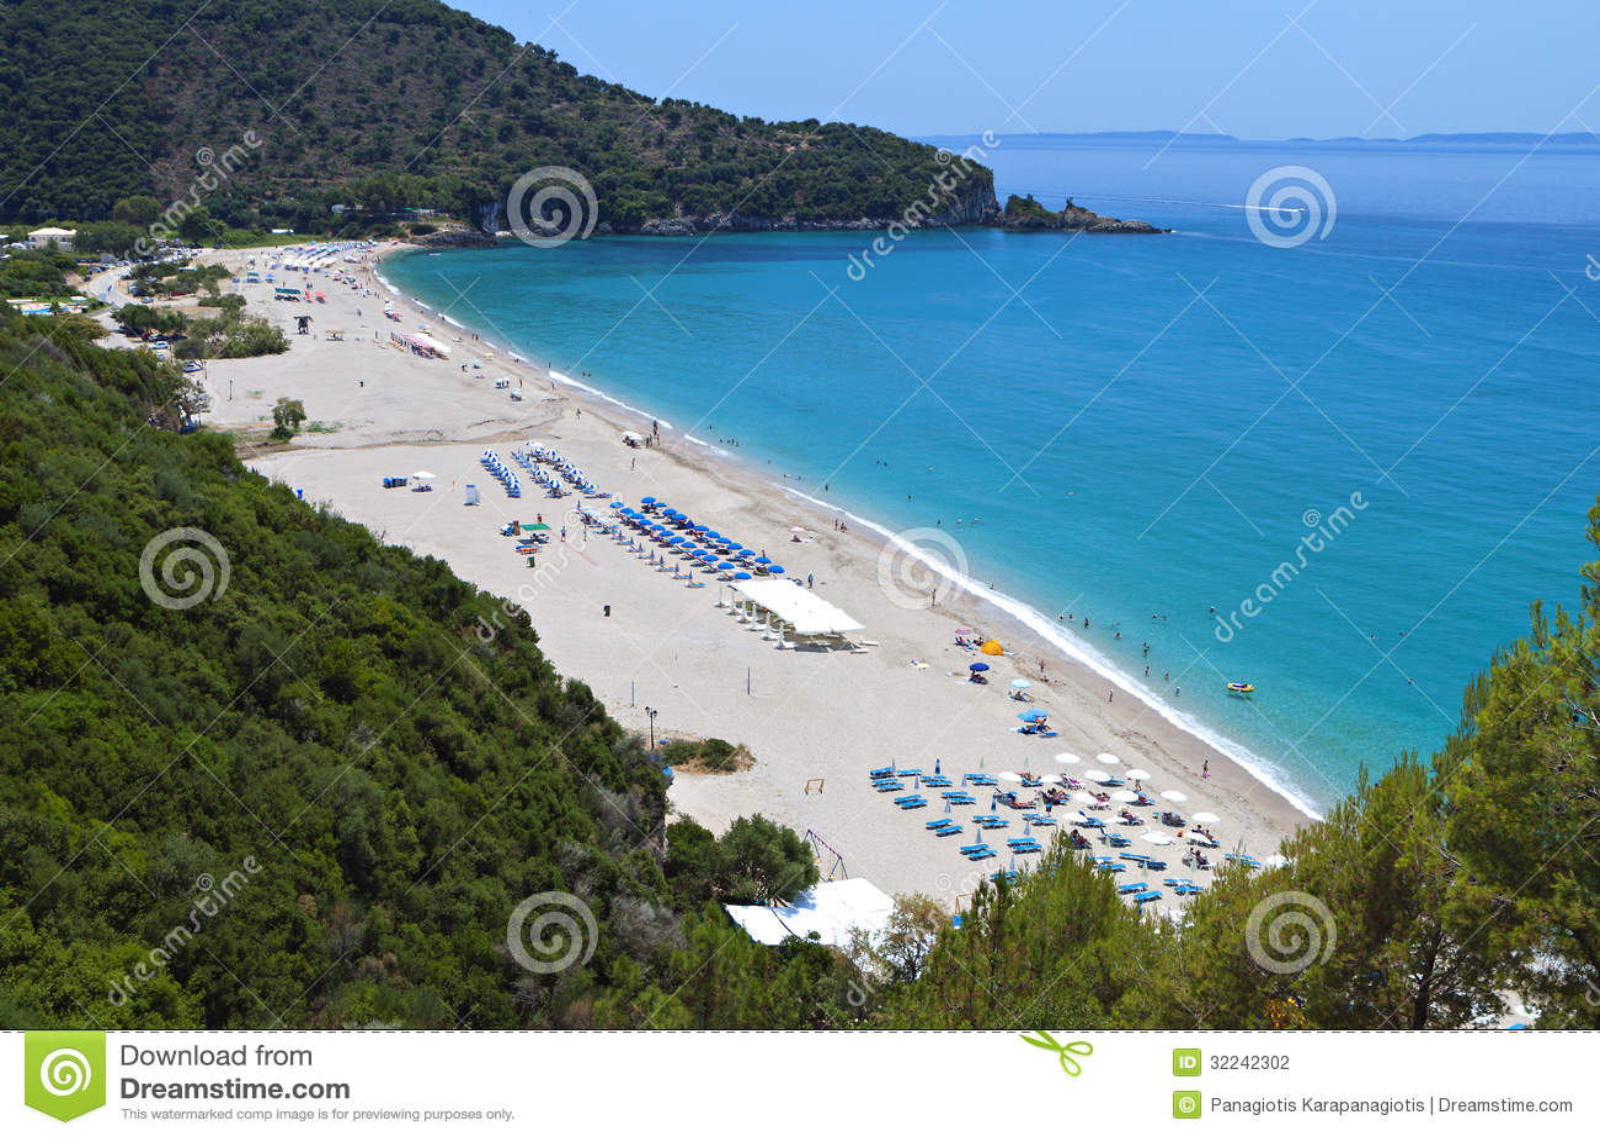 Syvota Greece  city images : Karavostasi Beach At Syvota, Greece Stock Photography Image ...